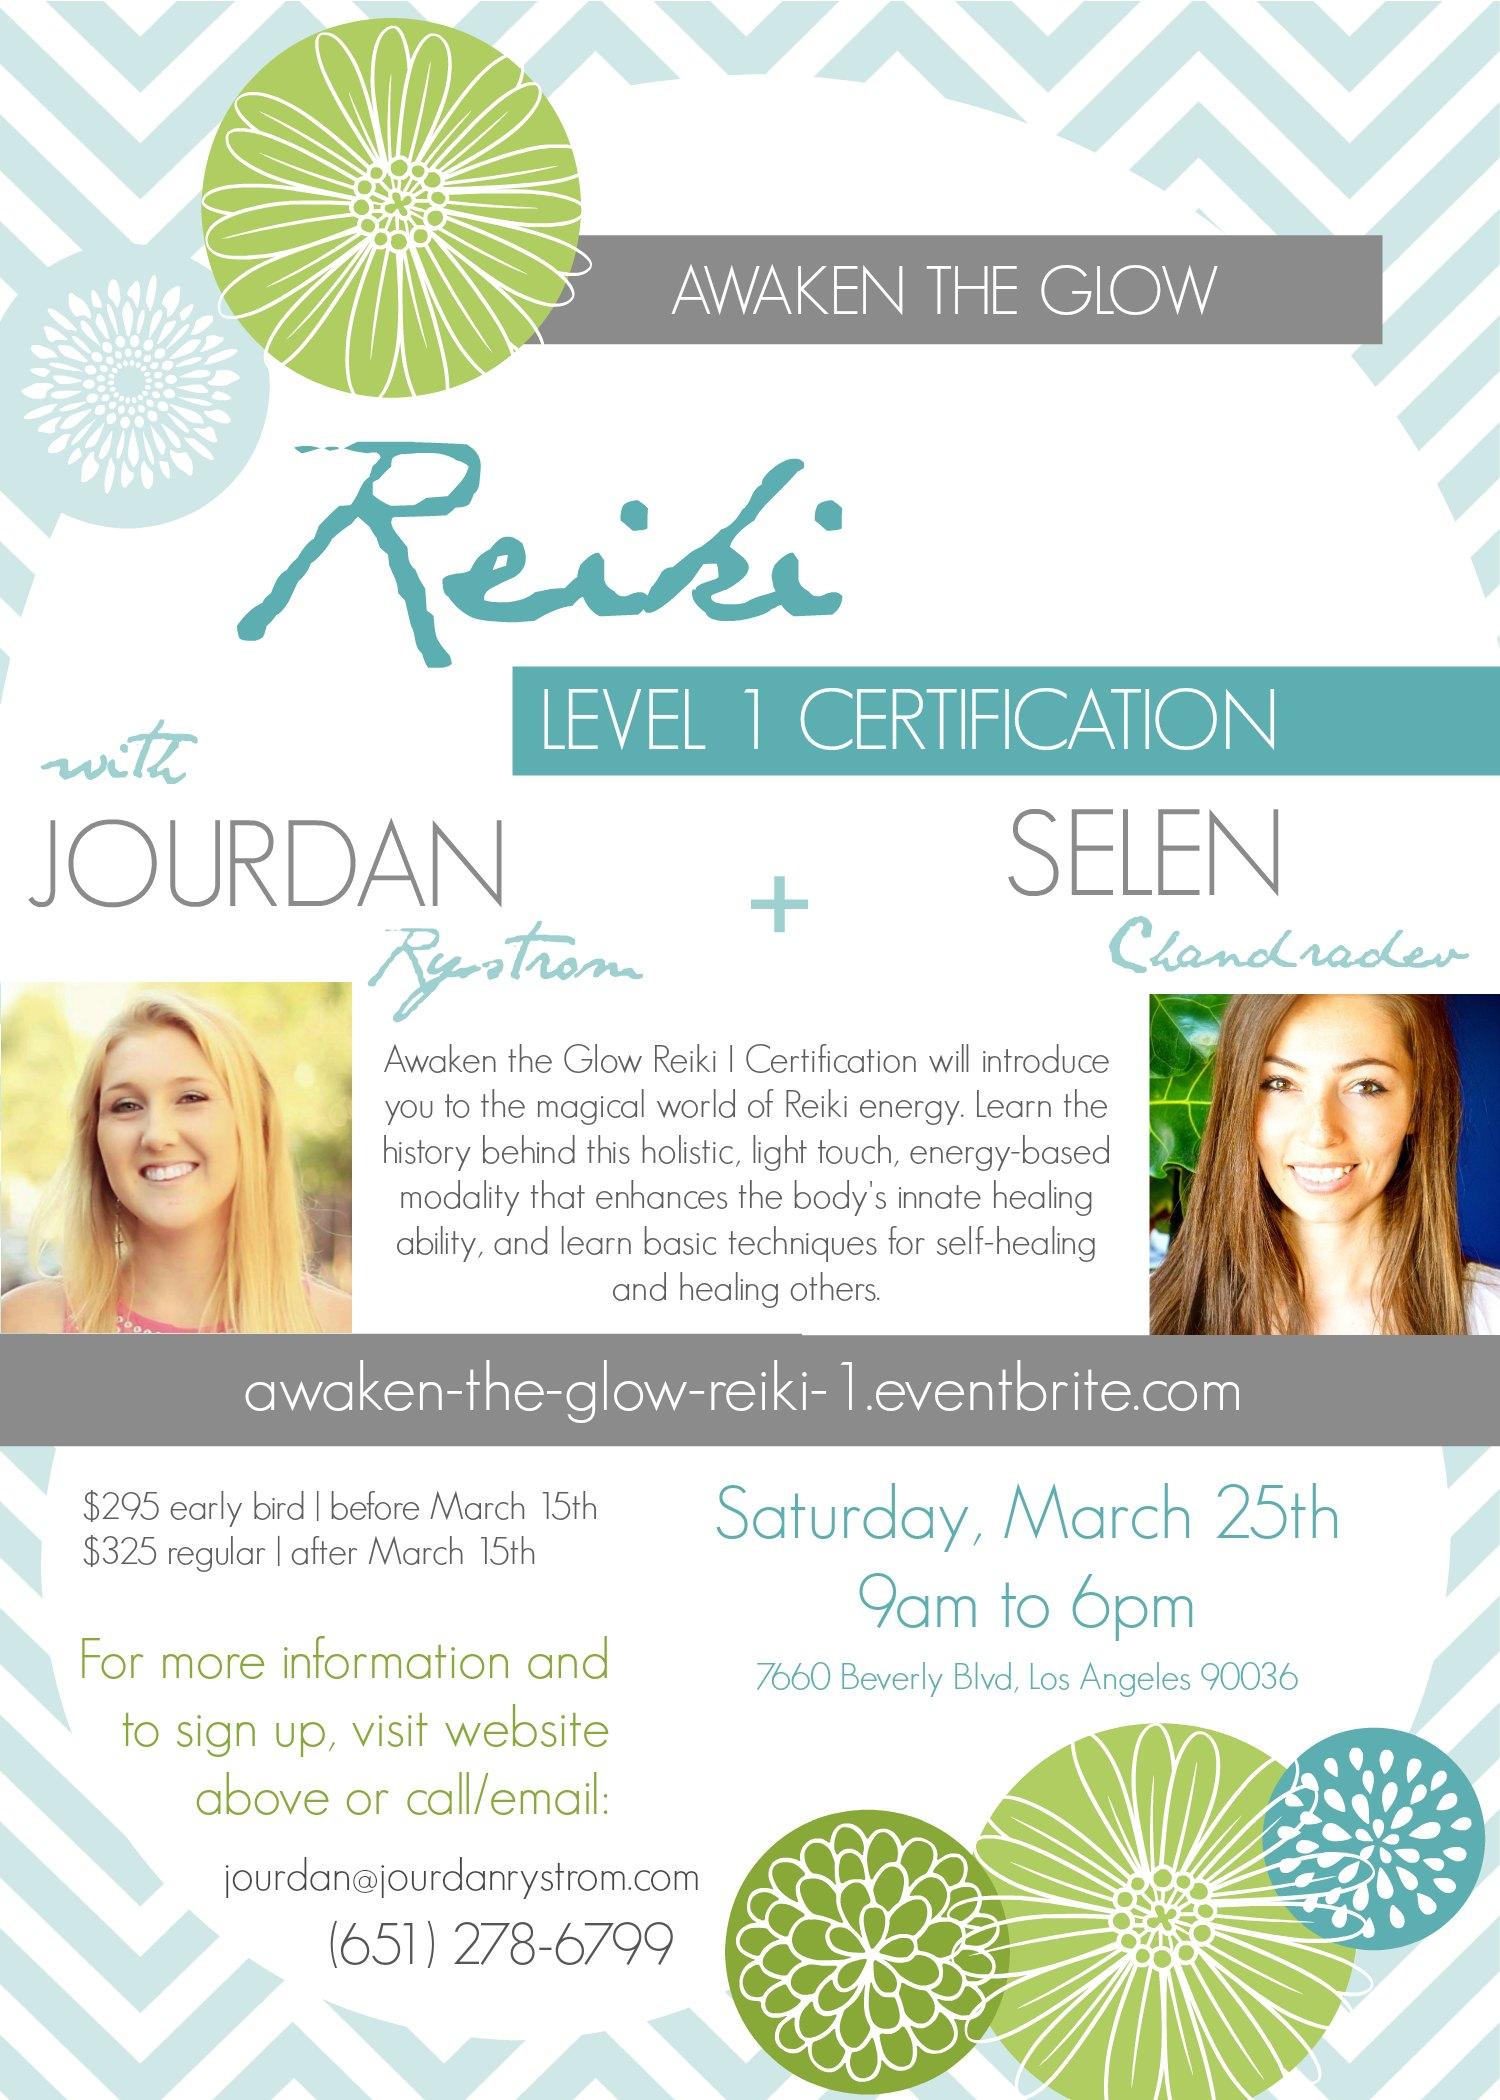 Awaken the Glow Reiki Level I Certification Poster